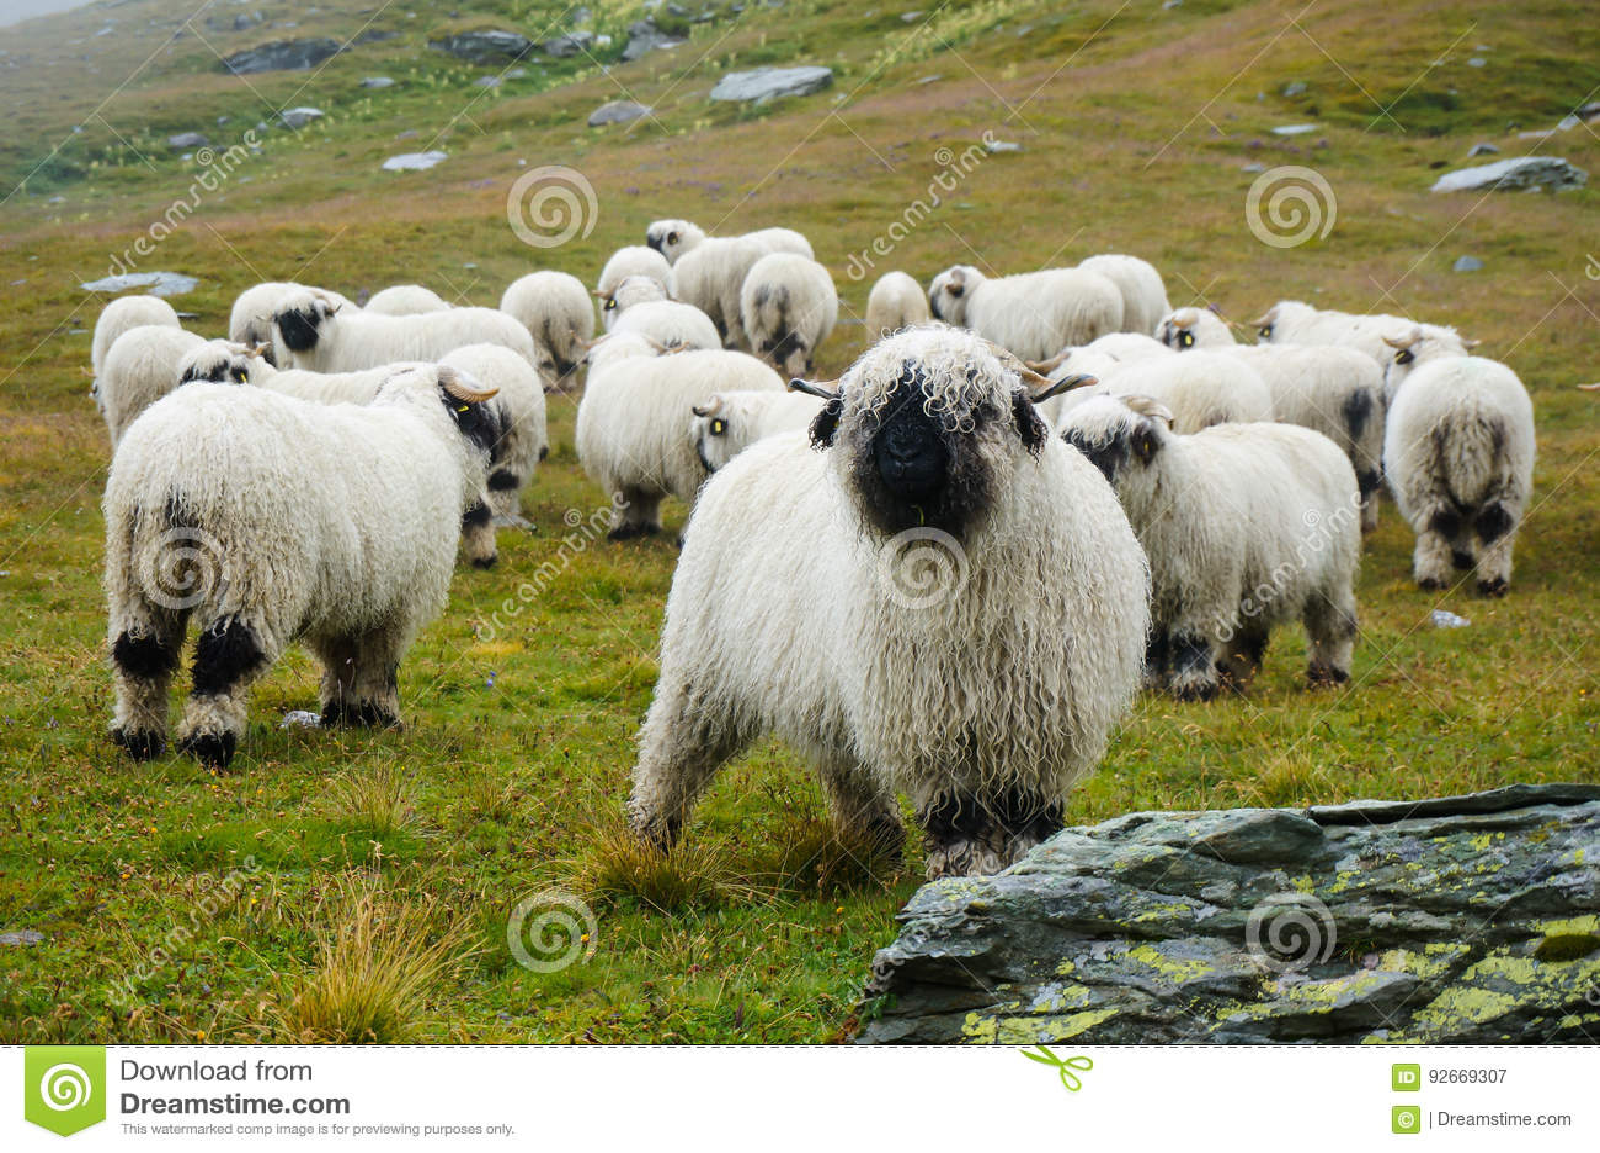 Valais Blacknose Sheep herd at Zermatt, Switzerland.